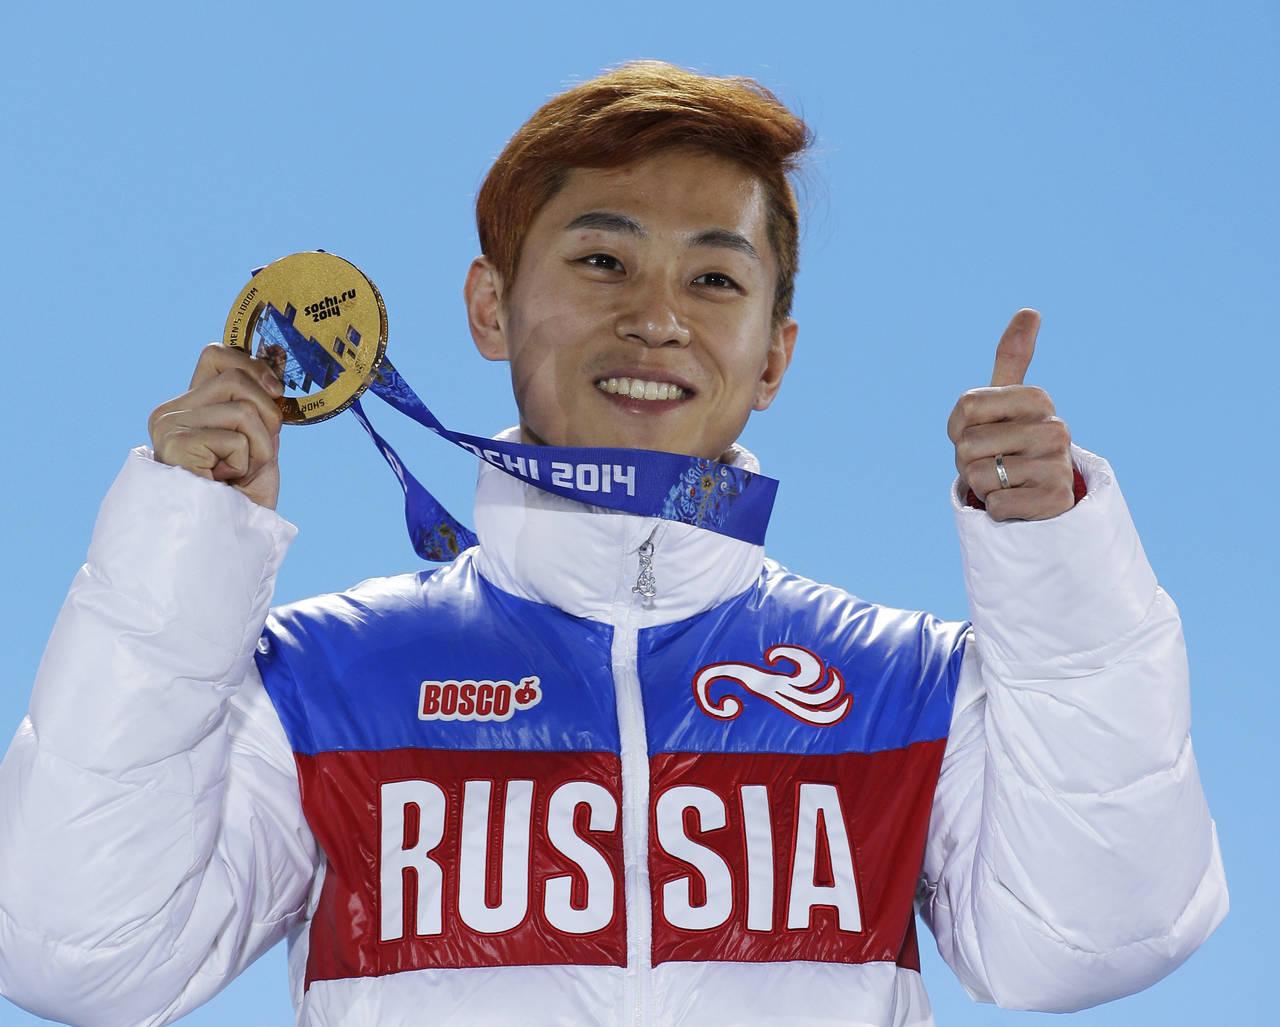 Rechazan apelación de deportistas rusos